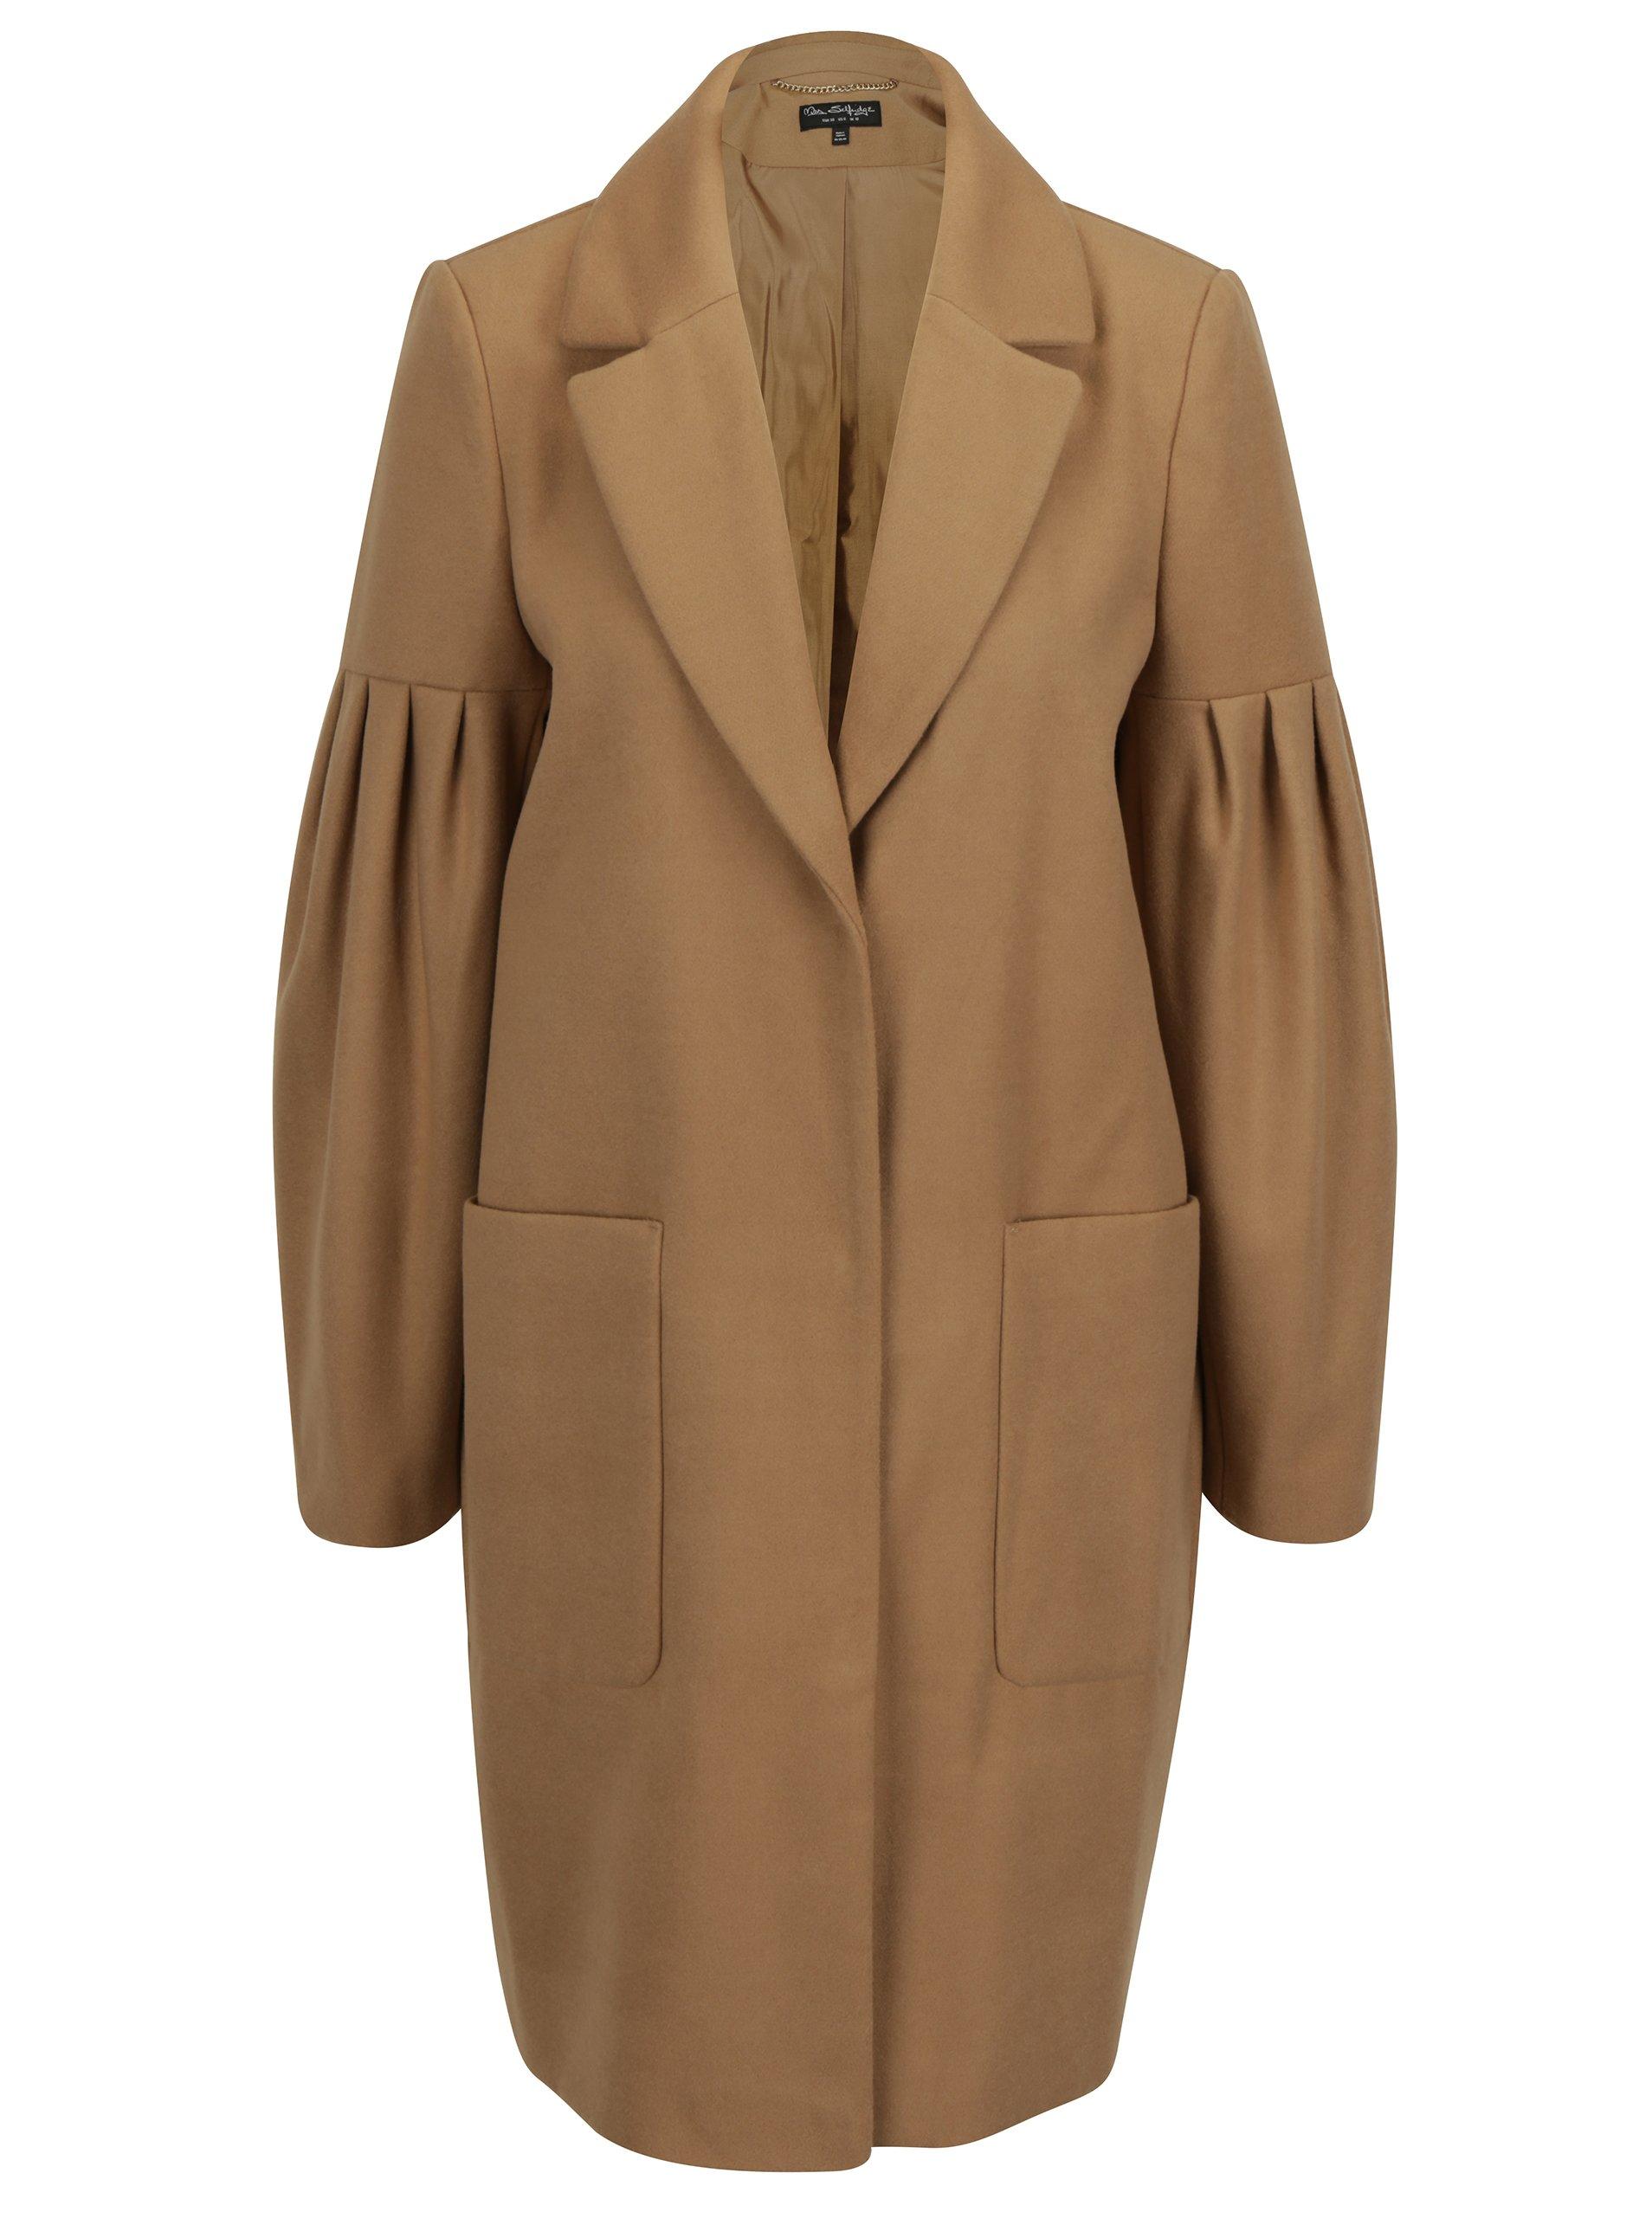 Béžový kabát s kapsami Miss Selfridge